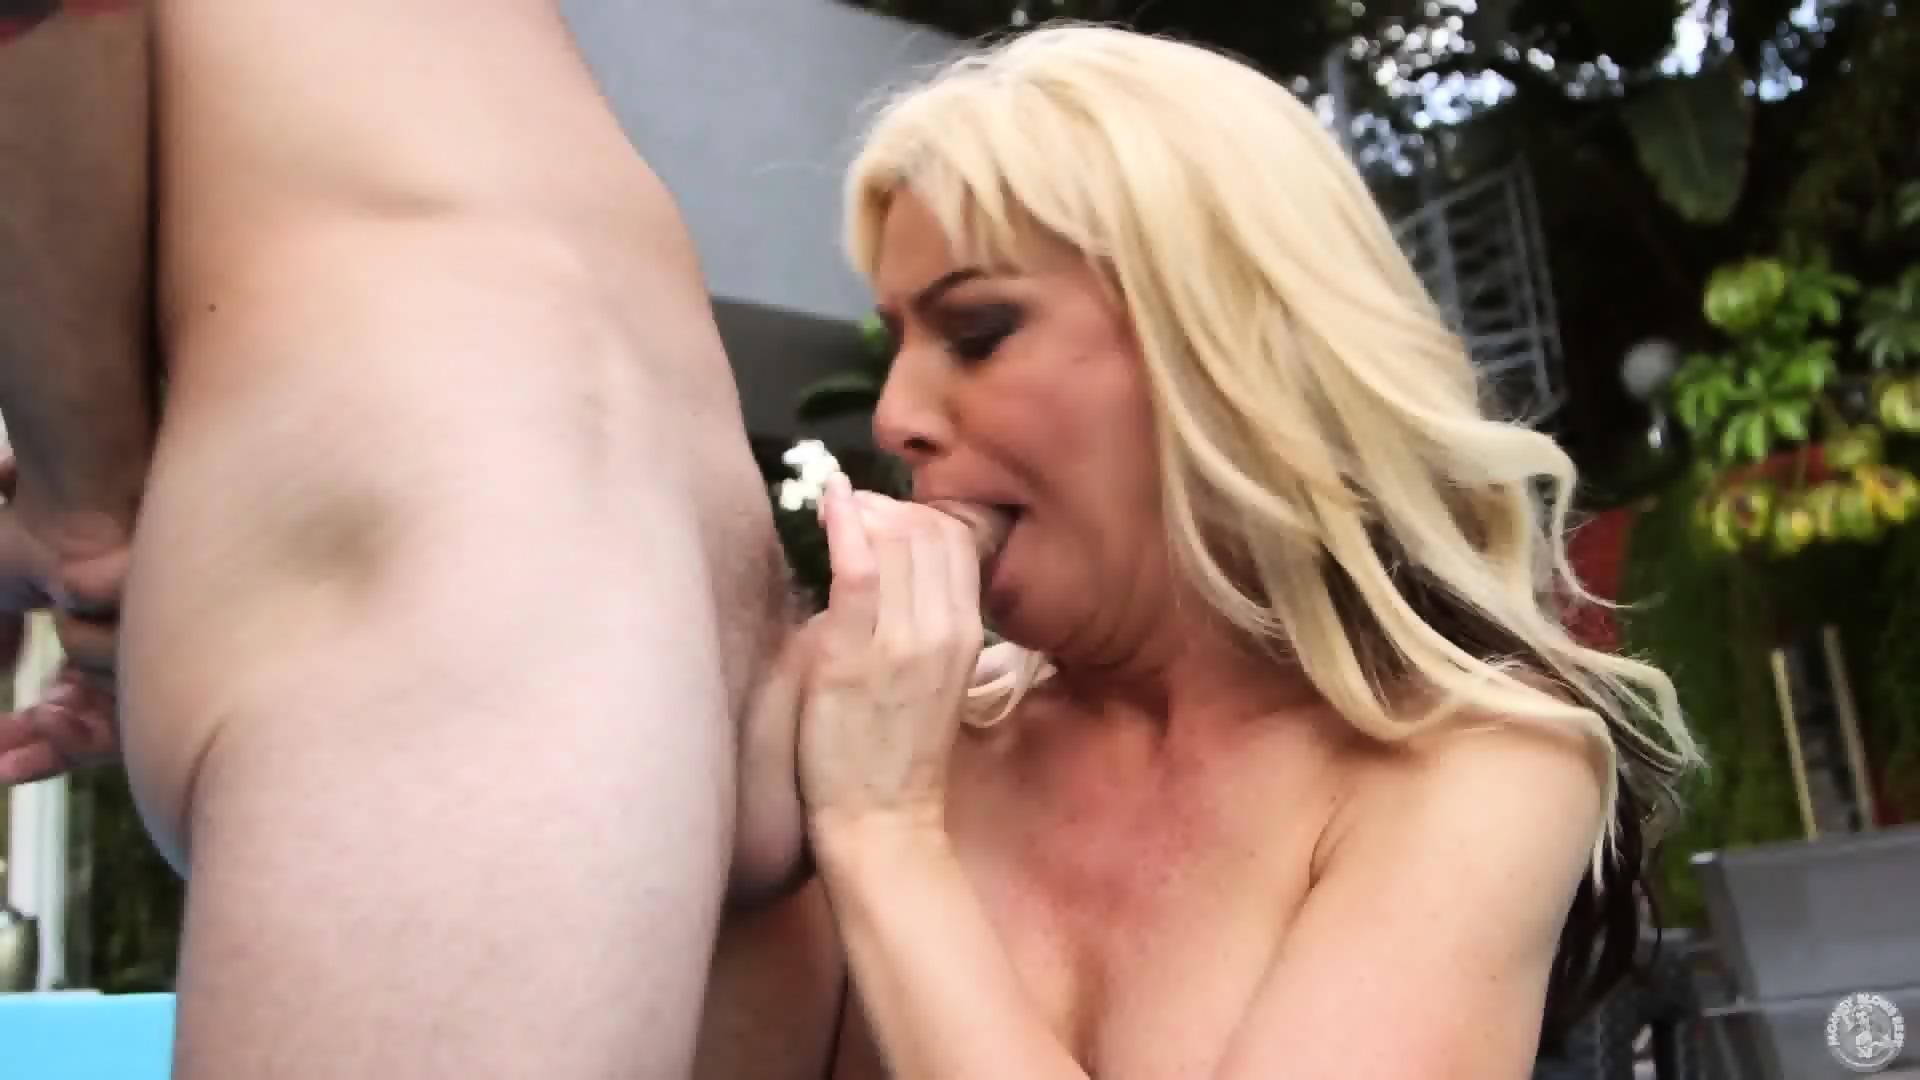 German big tits porn galleries